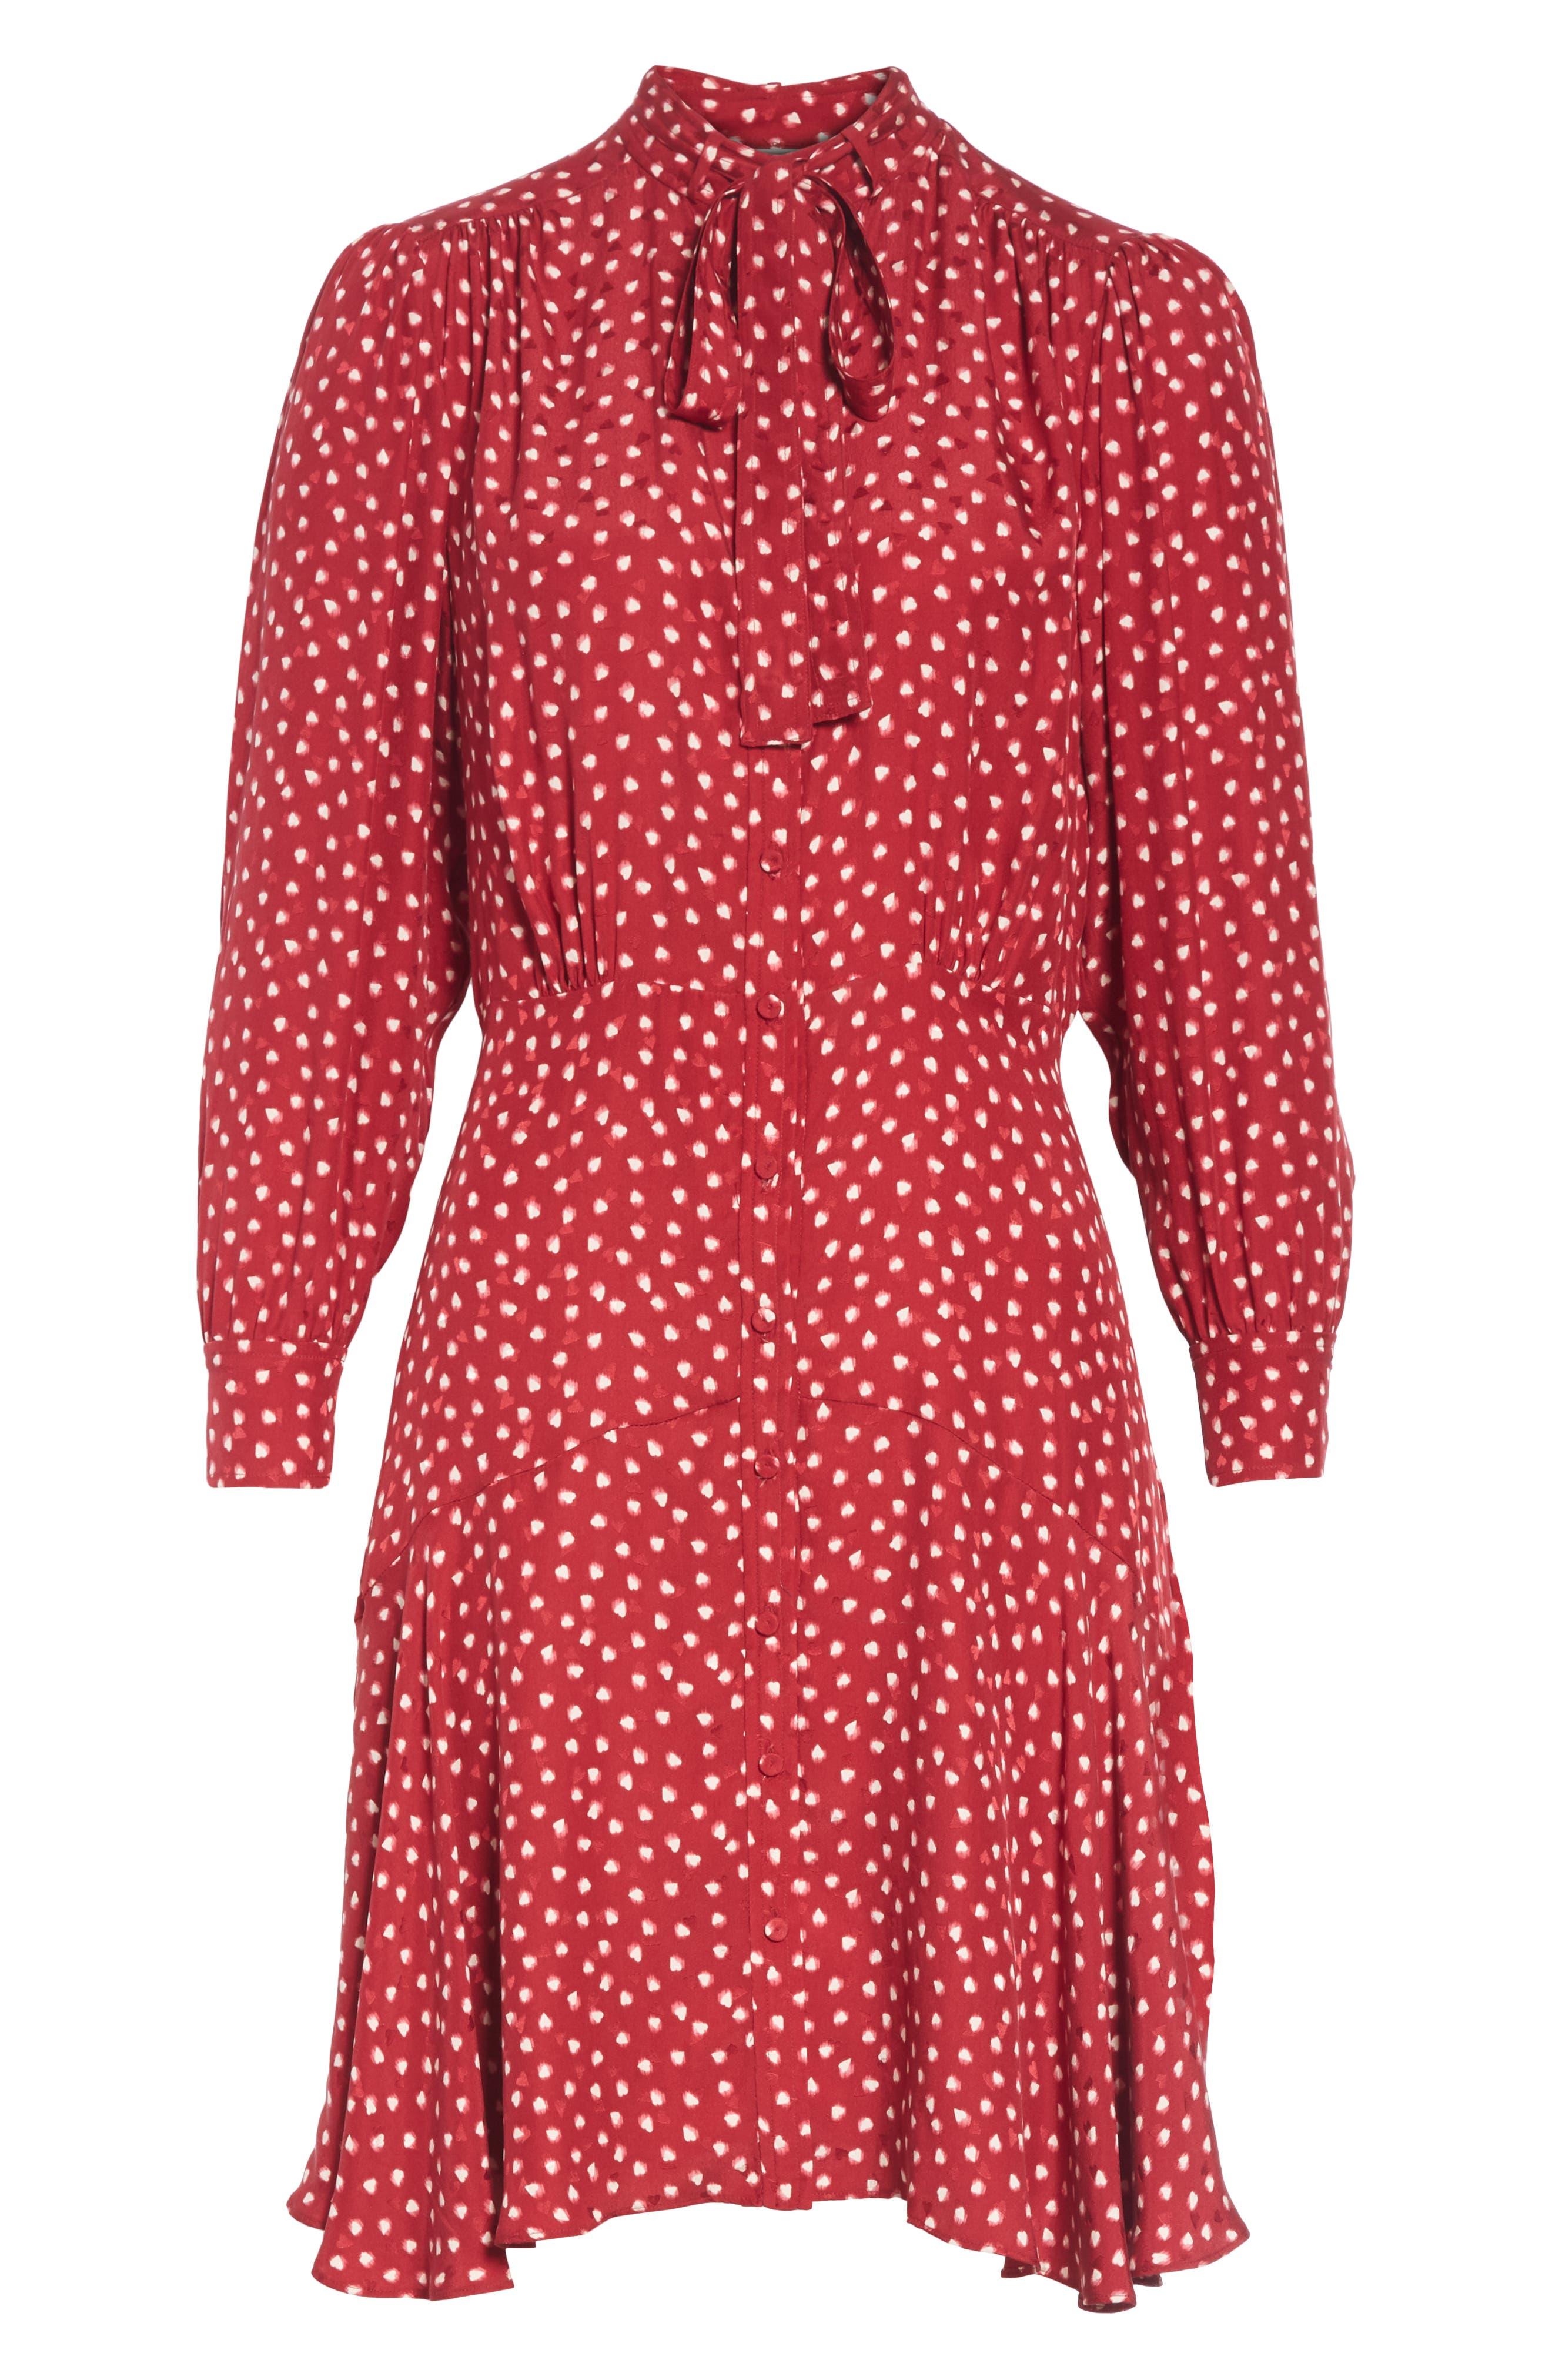 REBECCA TAYLOR,                             Dot Print Fit & Flare Dress,                             Alternate thumbnail 6, color,                             602